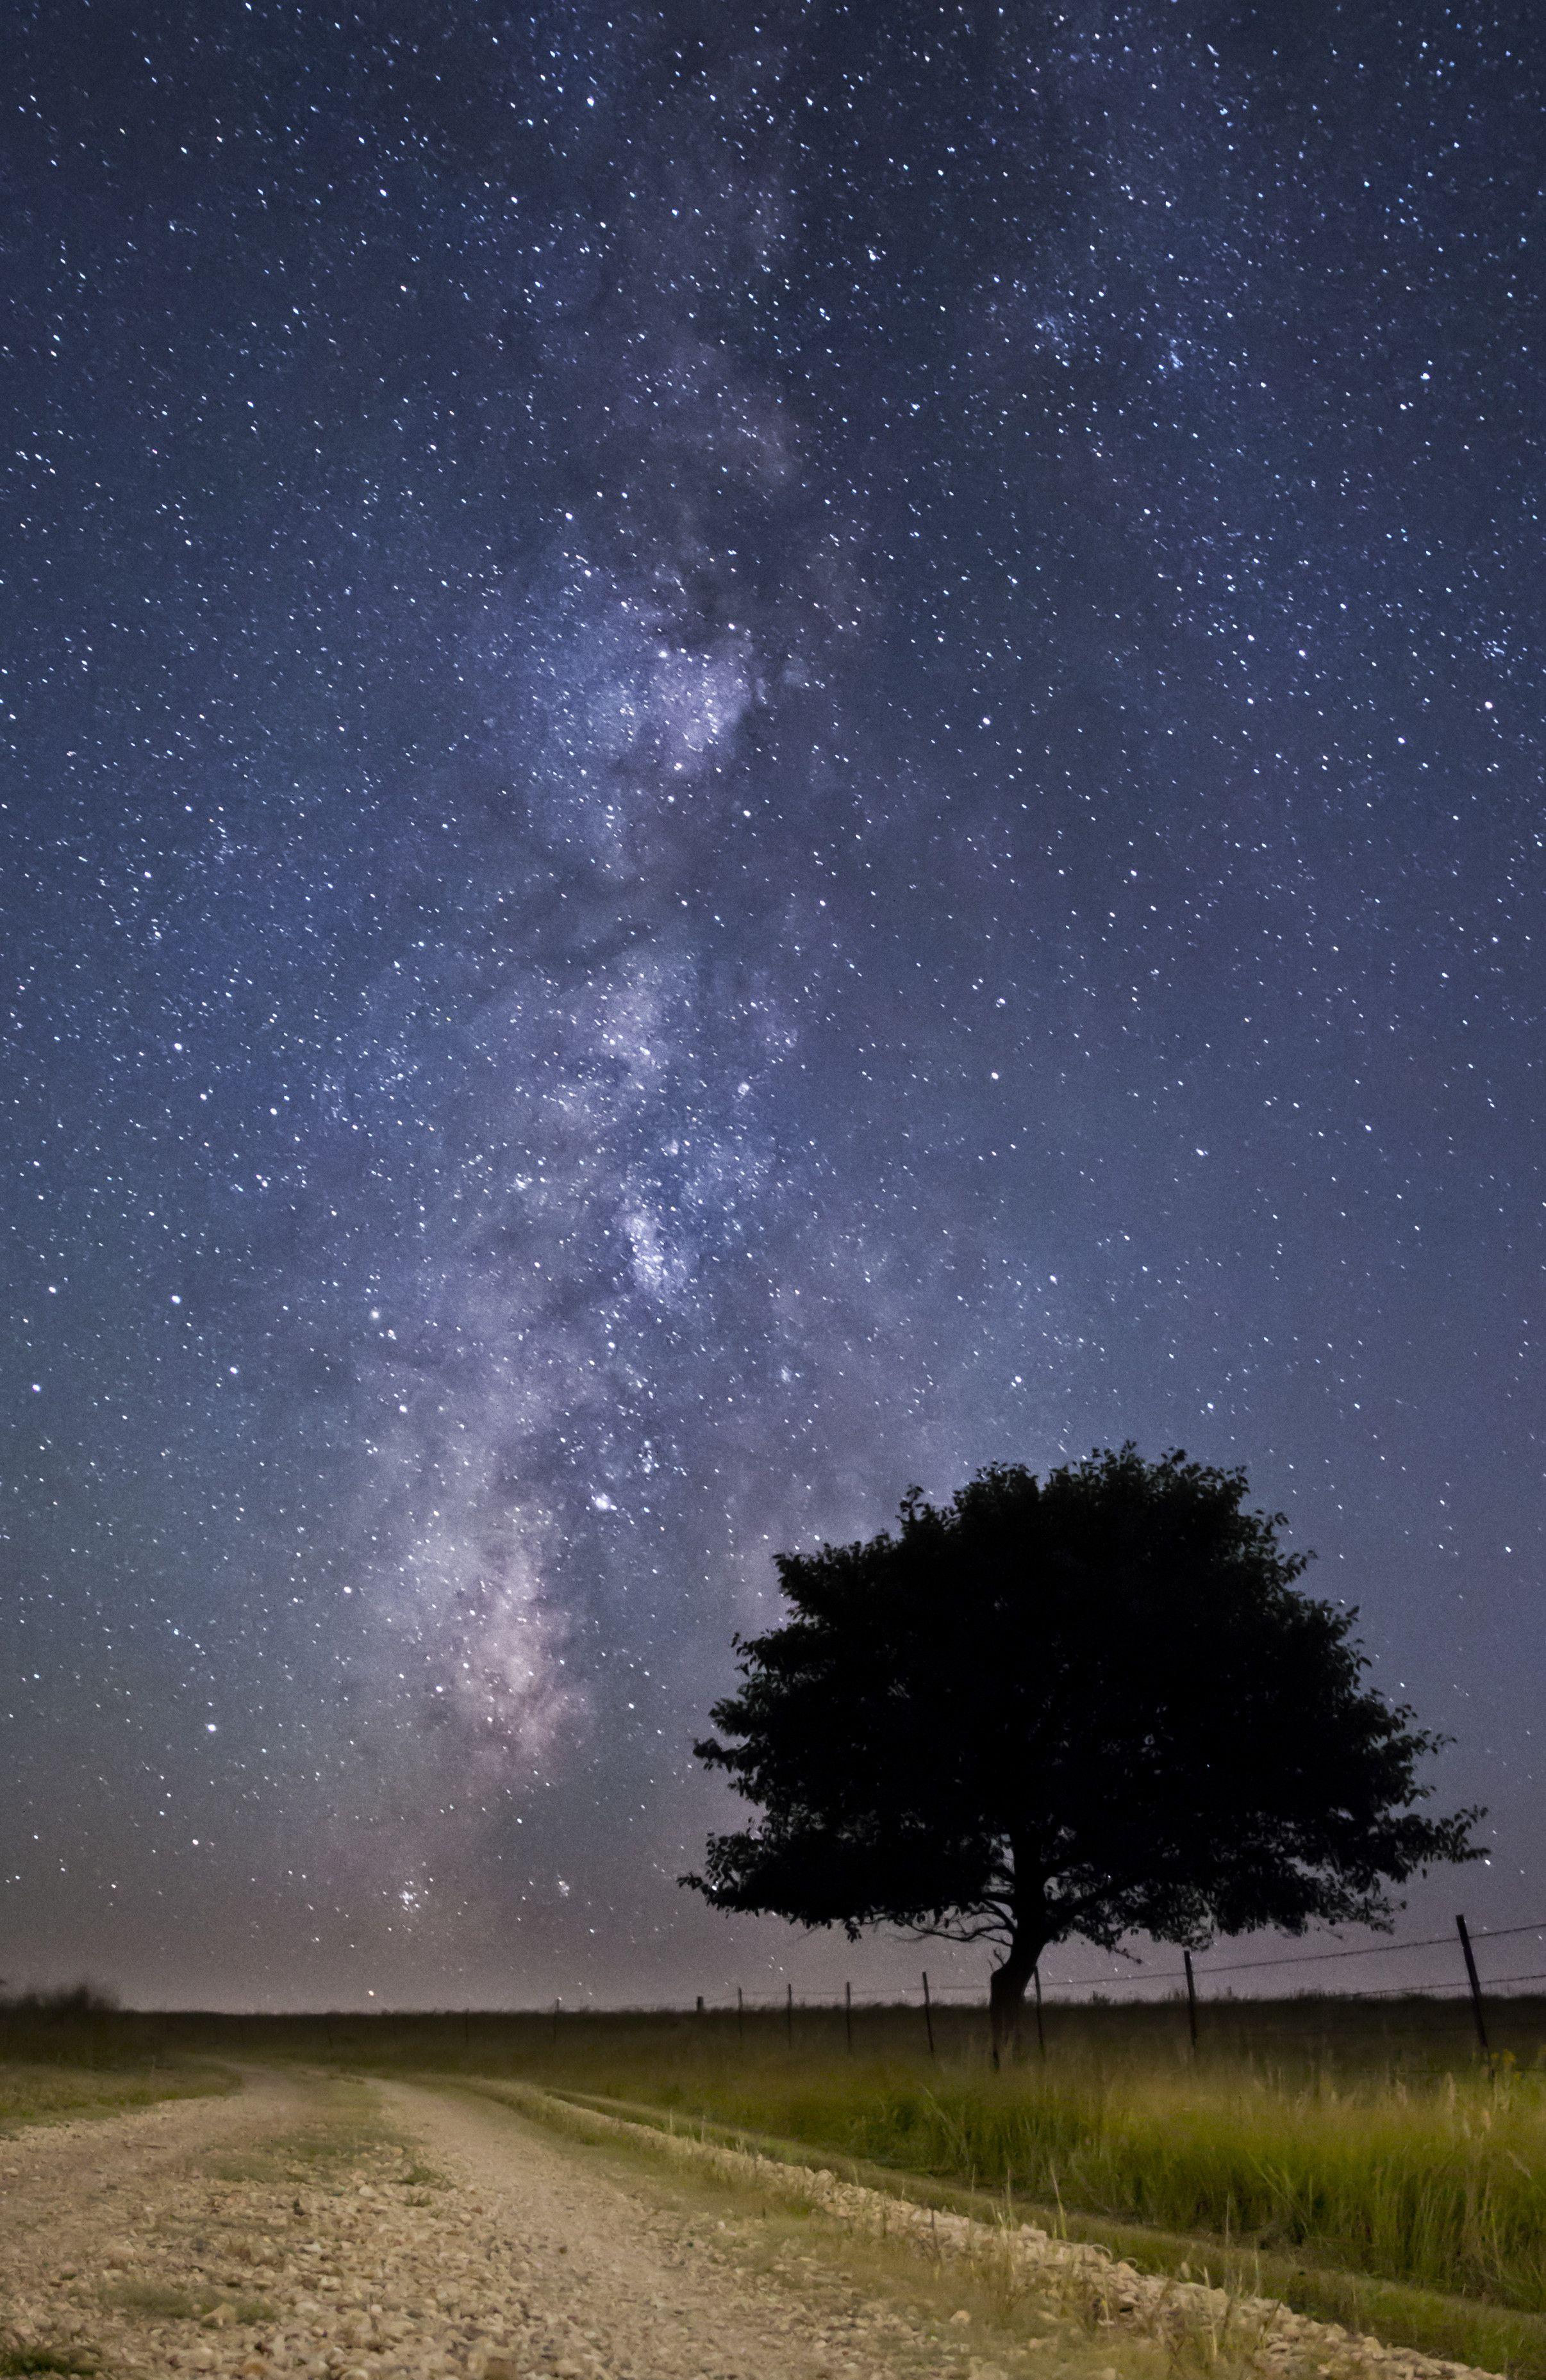 astronomy rastronomy reddit - HD2412×3714